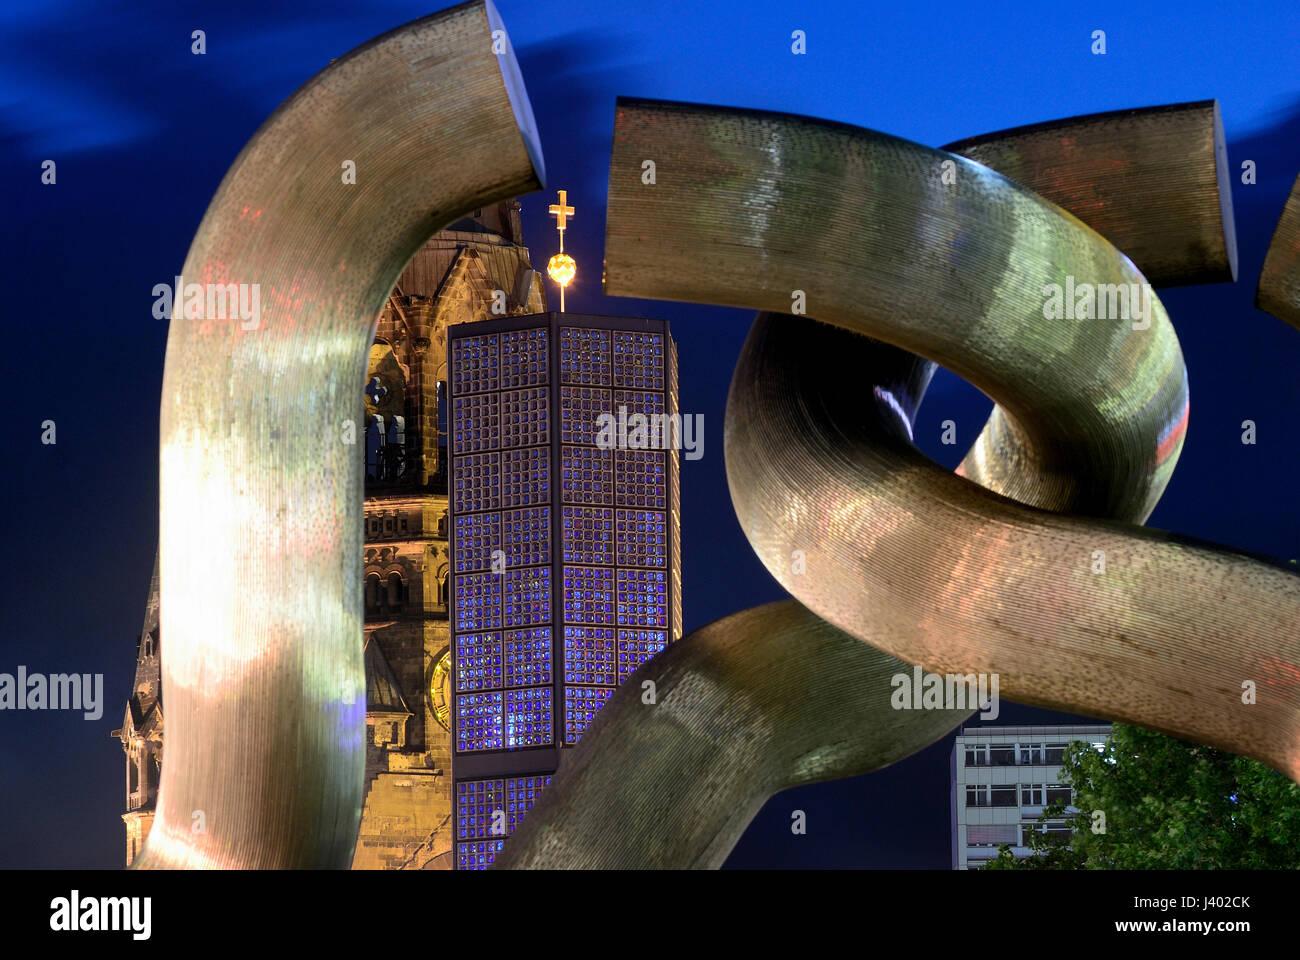 kudamm and kaiser-wilhelm-gedächtnis-kirche in berlin, kurfurstendamm, modernity, night, photo by kazimierz - Stock Image